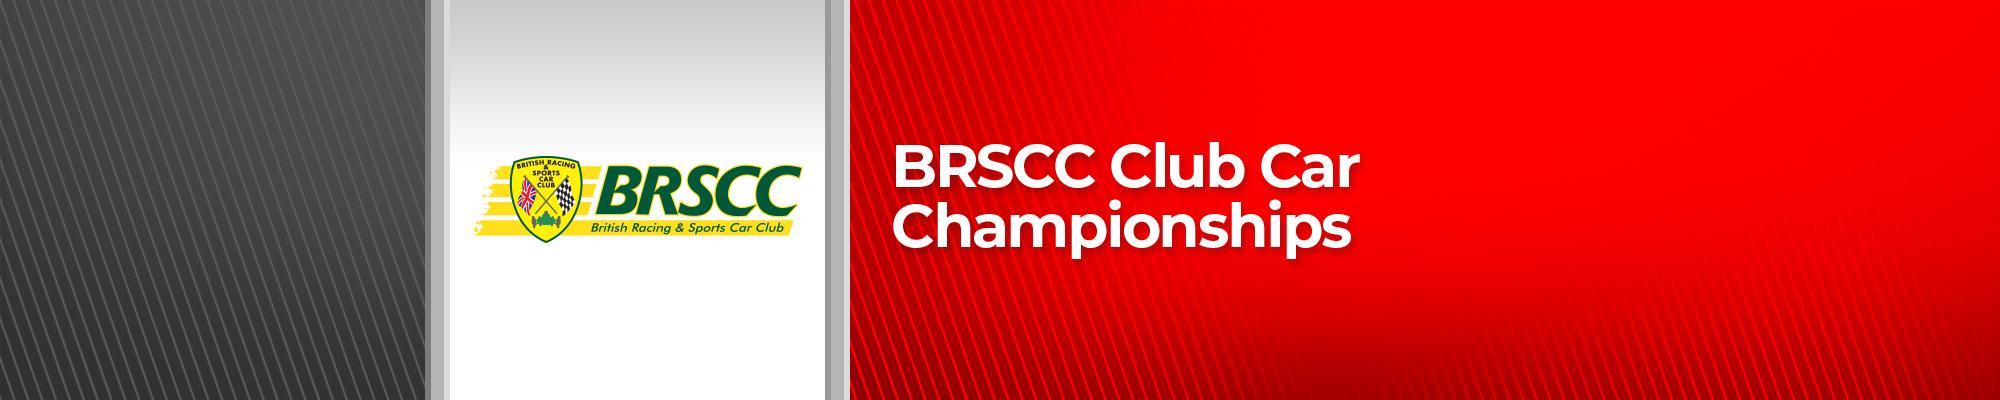 BRSCC Club Car Championships